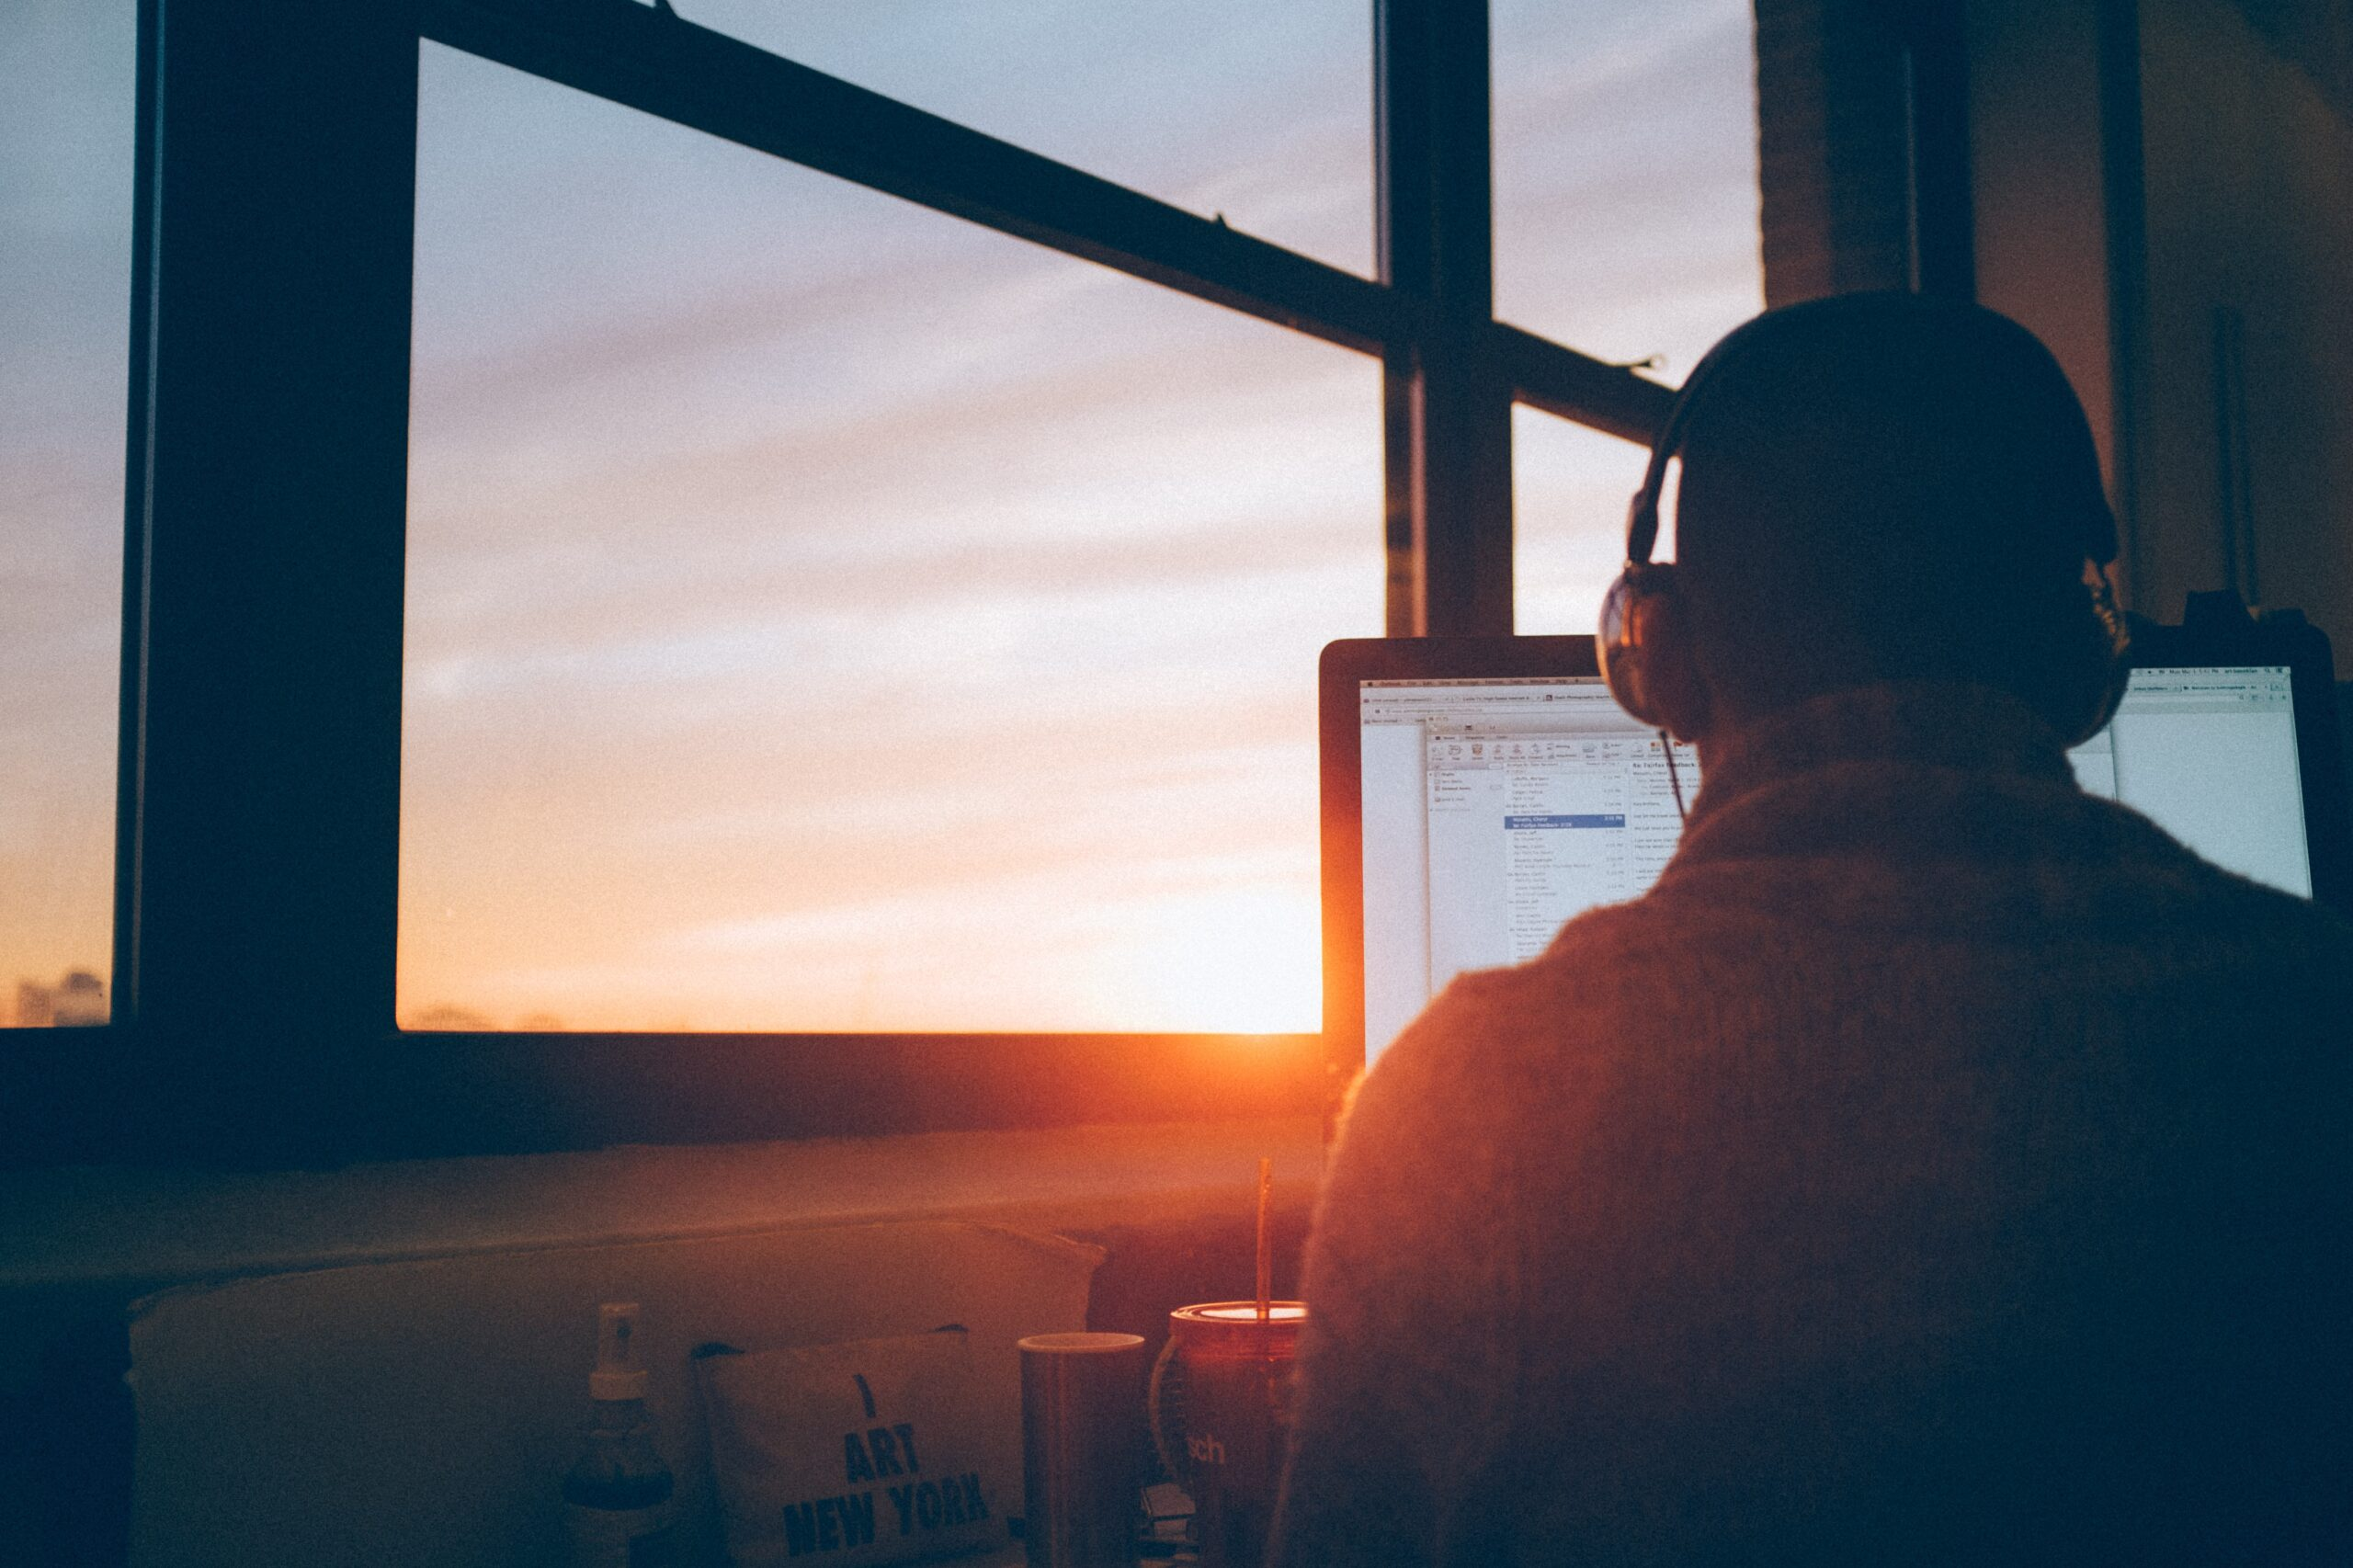 man sitting facing monitor